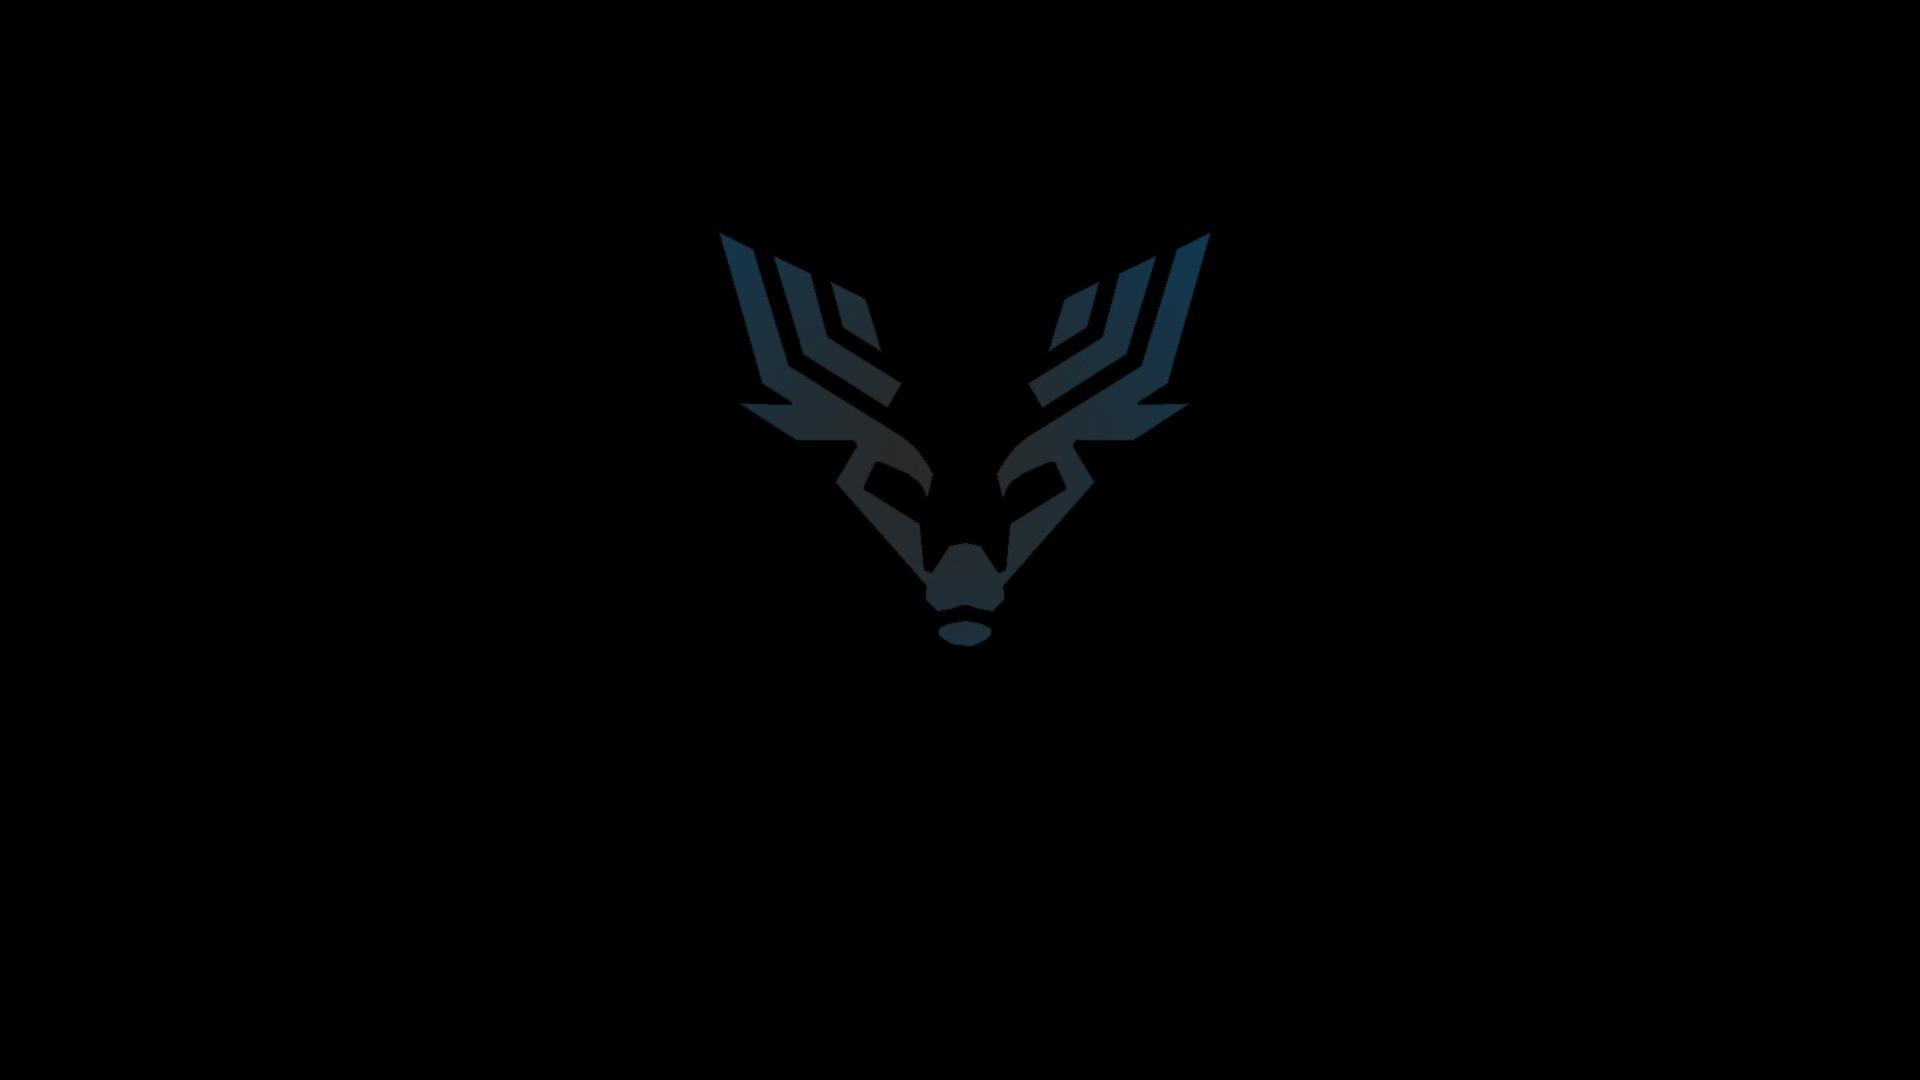 Free Download Blue Black Wallpaper 1980x1080 Blue Black Minimalistic Logos 1980x1080 For Your Desktop Mobile Tablet Explore 49 1980x1080 Wallpapers Hd Free Hd Wallpaper 19x1080 Hd Wallpaper Downloads Free